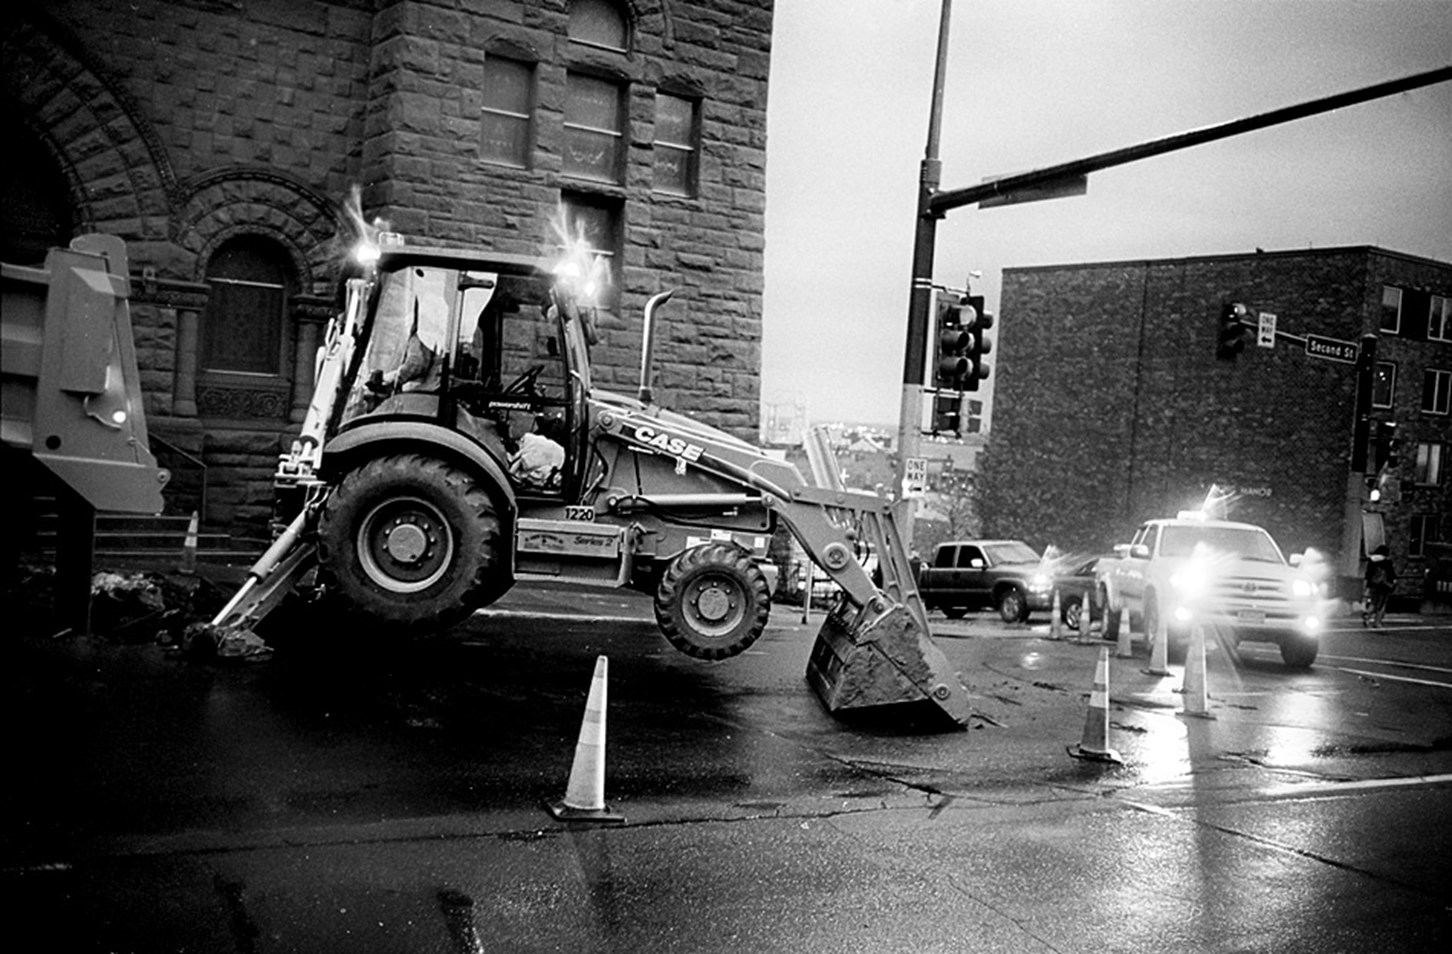 Repairing The Road Near Dusk, Duluth, Minnesota, November 2008